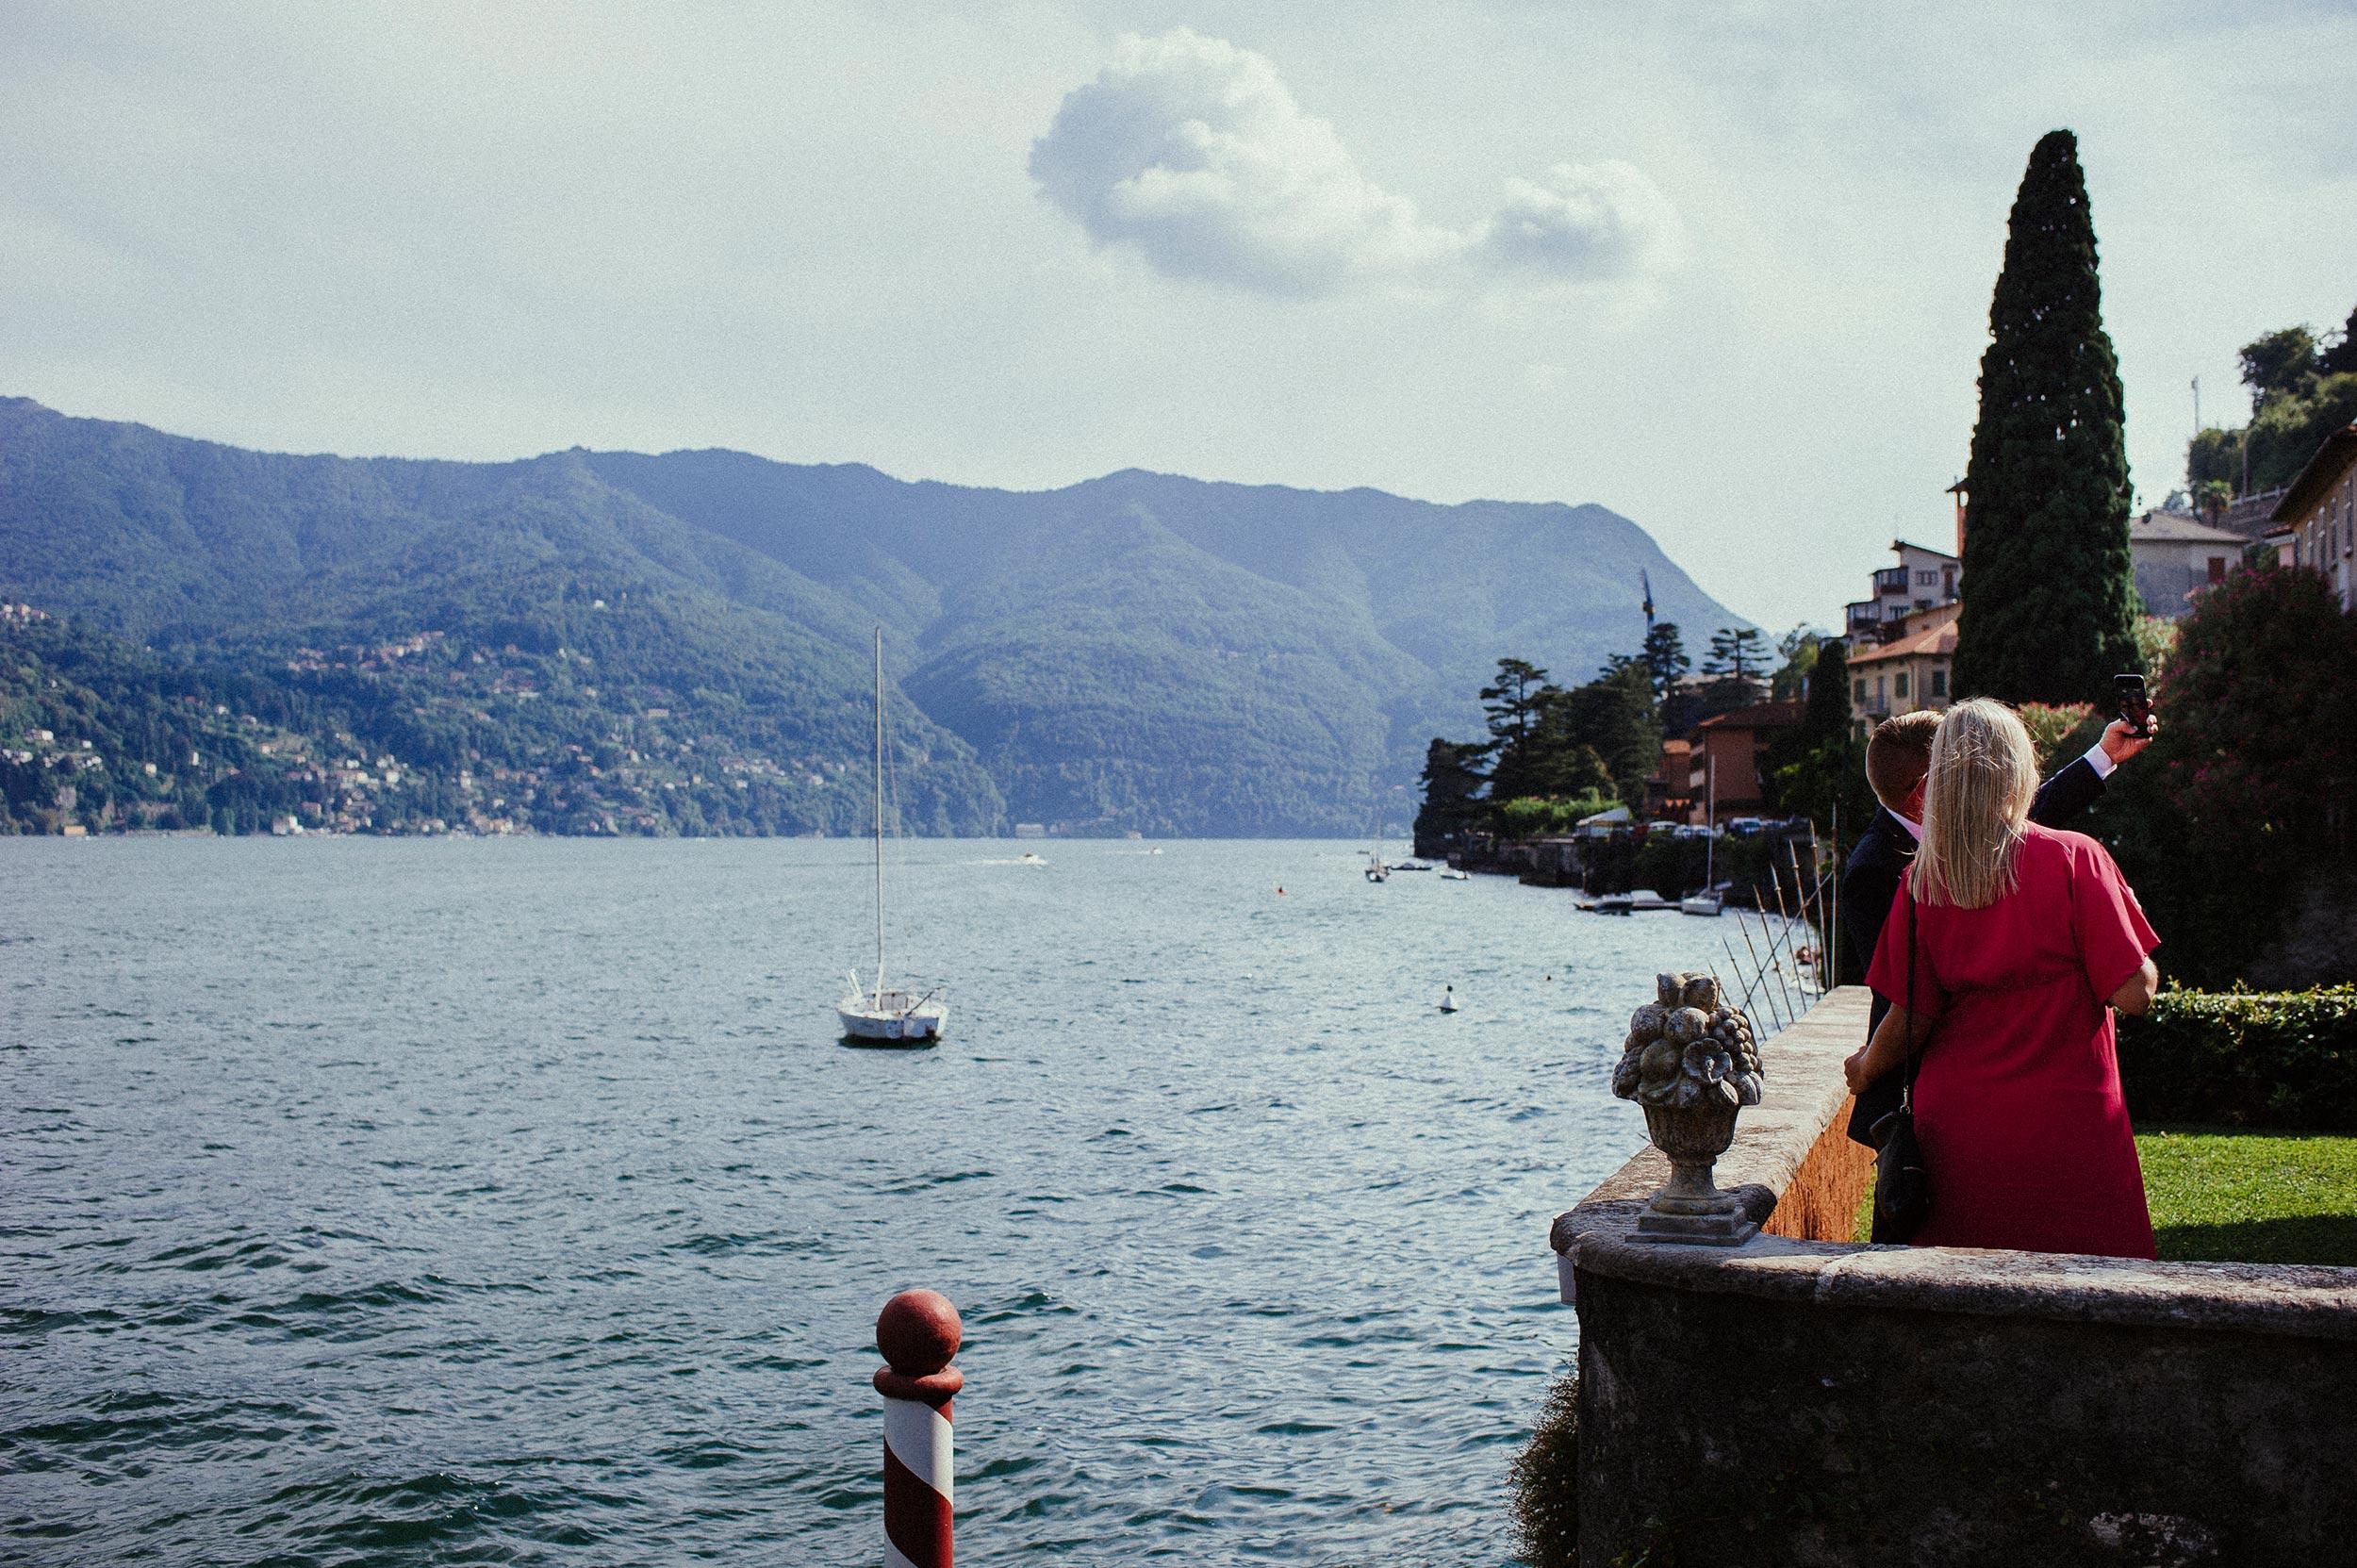 2018-Villa-Regina-Teodolinda-Lake-Como-Wedding-Photographer-Italy-Alessandro-Avenali-194.jpg